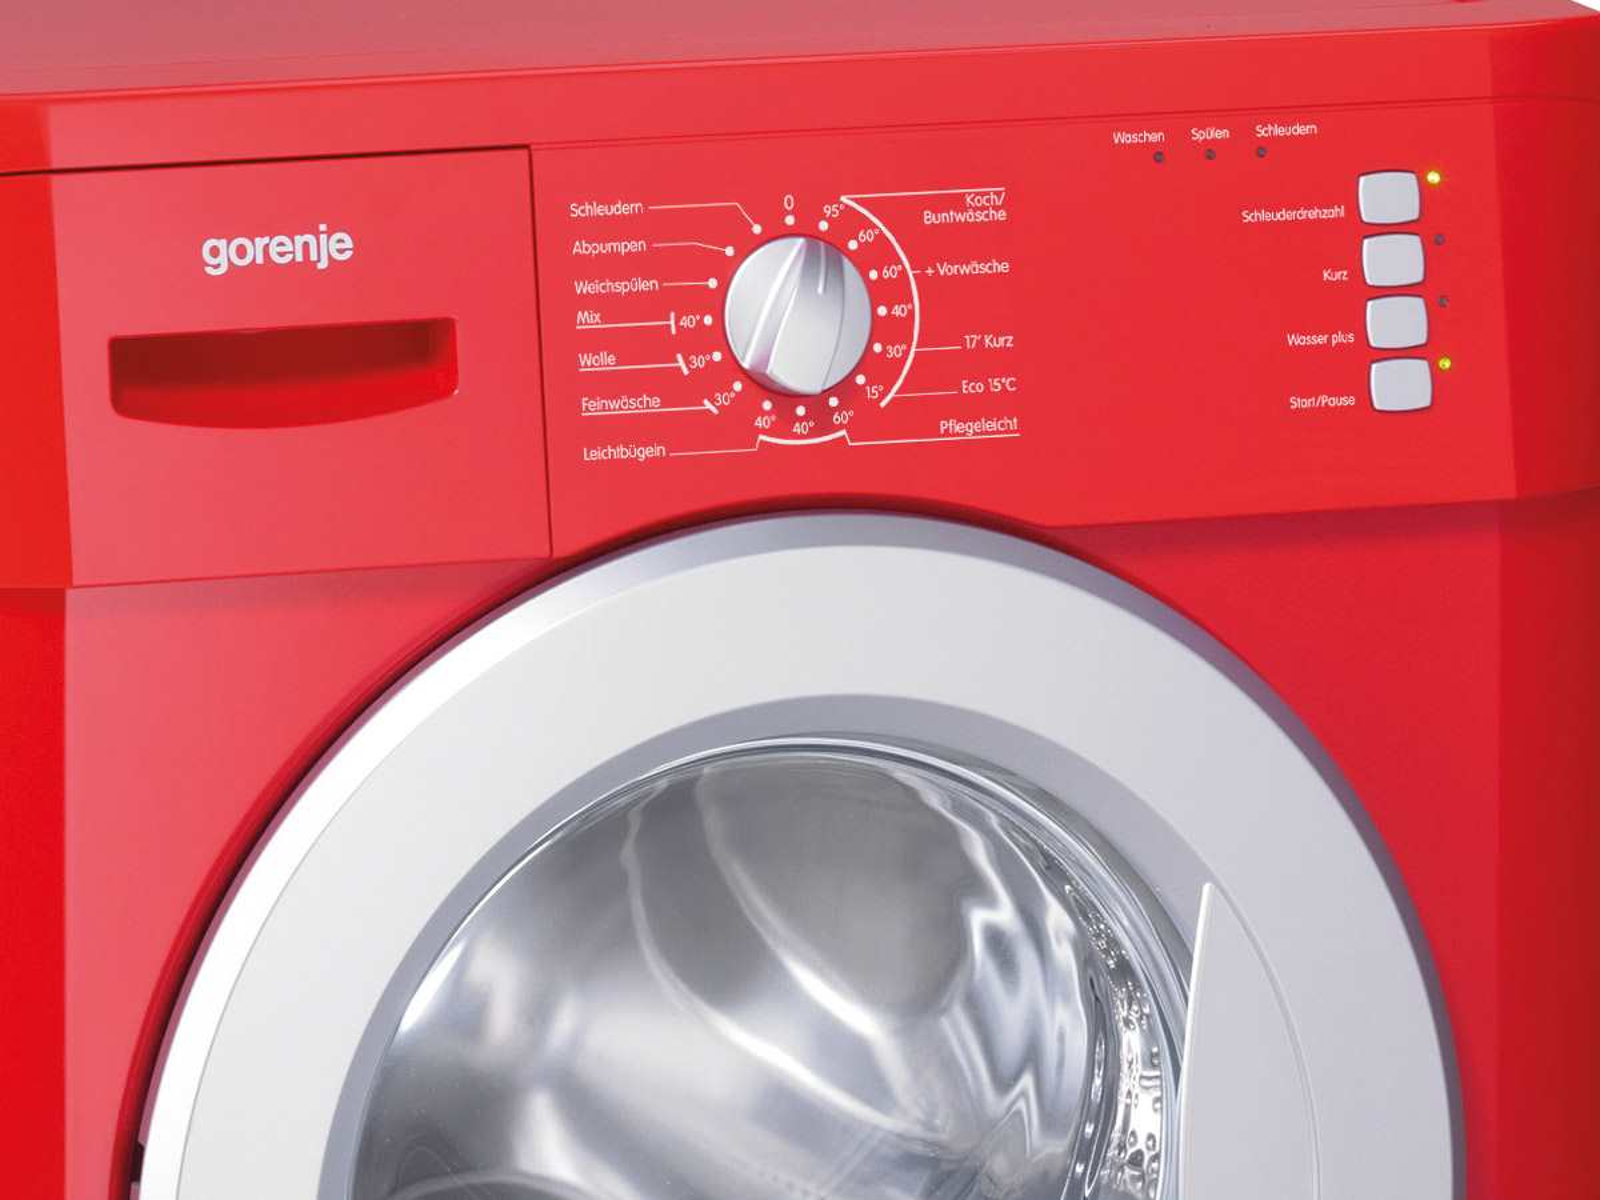 gorenje wa 735 rd stand waschmaschine rot f r 318 90 eur. Black Bedroom Furniture Sets. Home Design Ideas